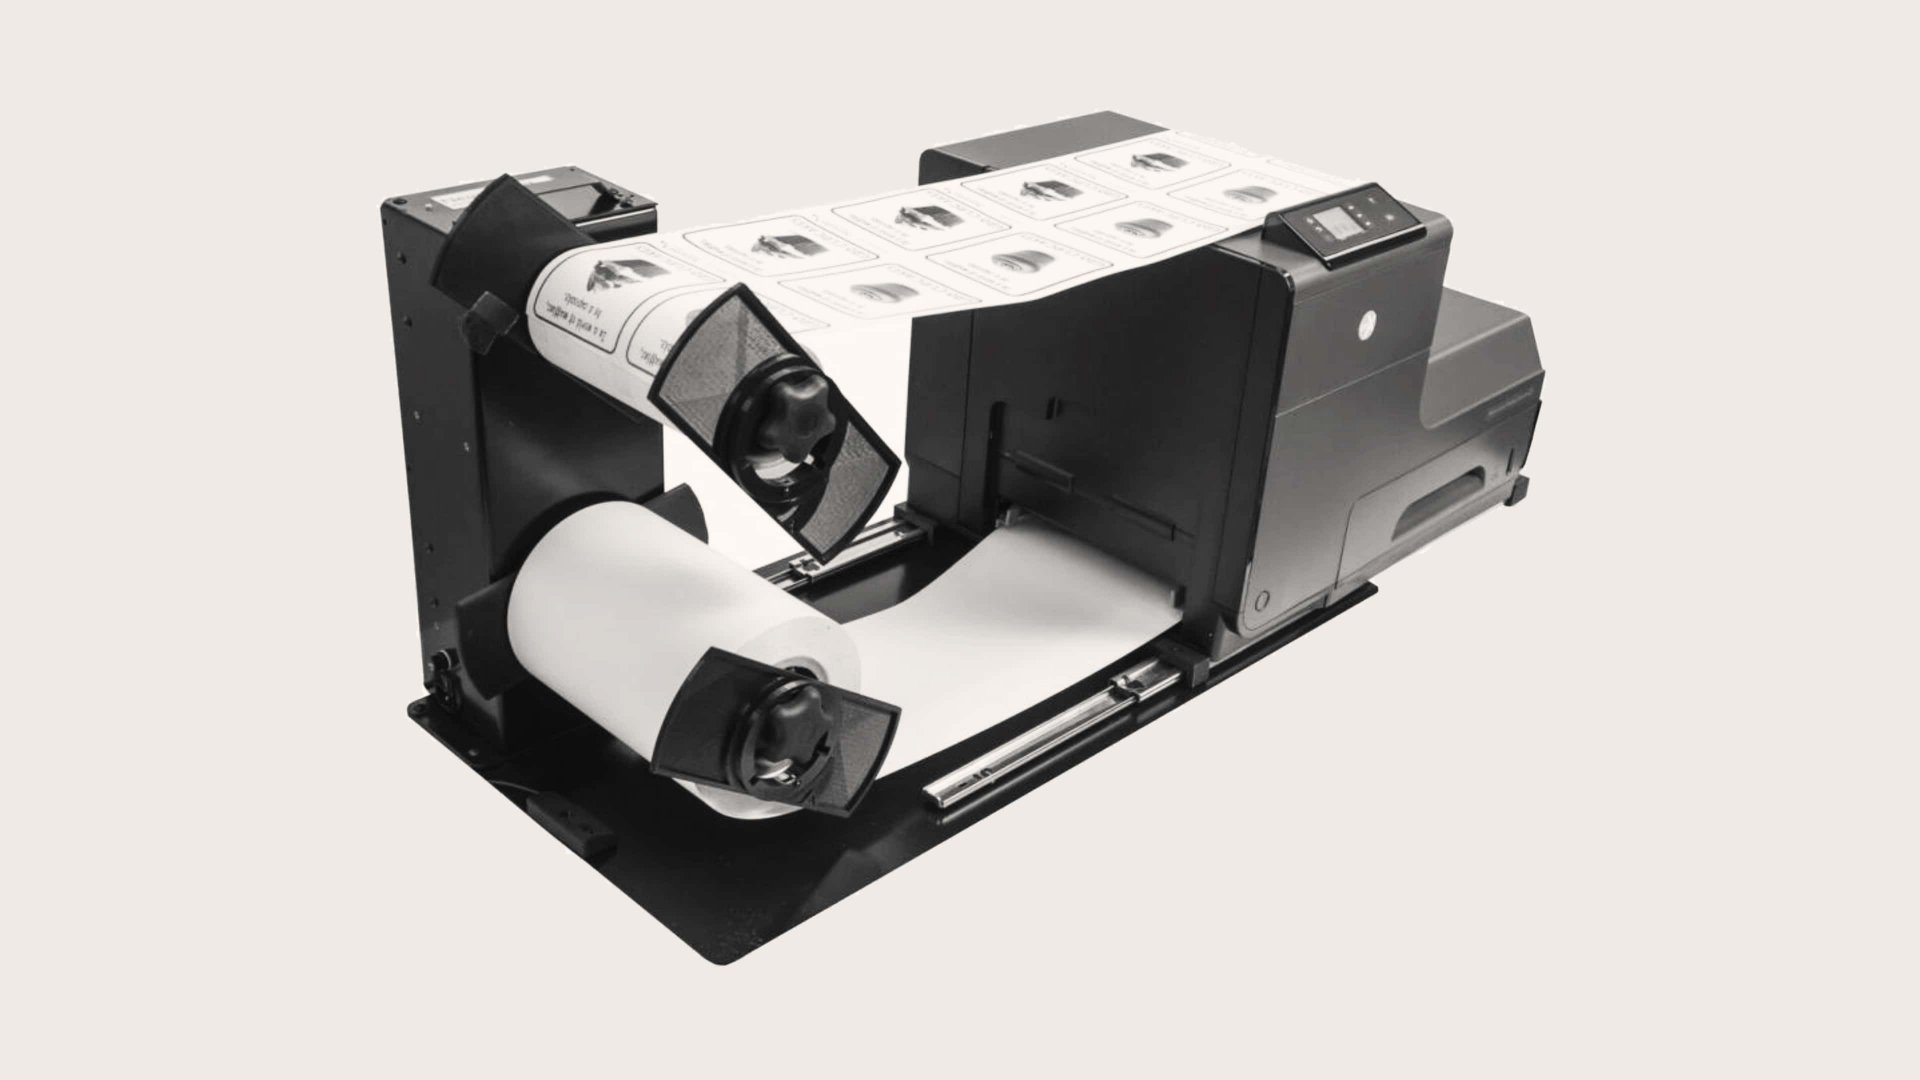 NeuraLabel 300x Etikettskrivare Industri